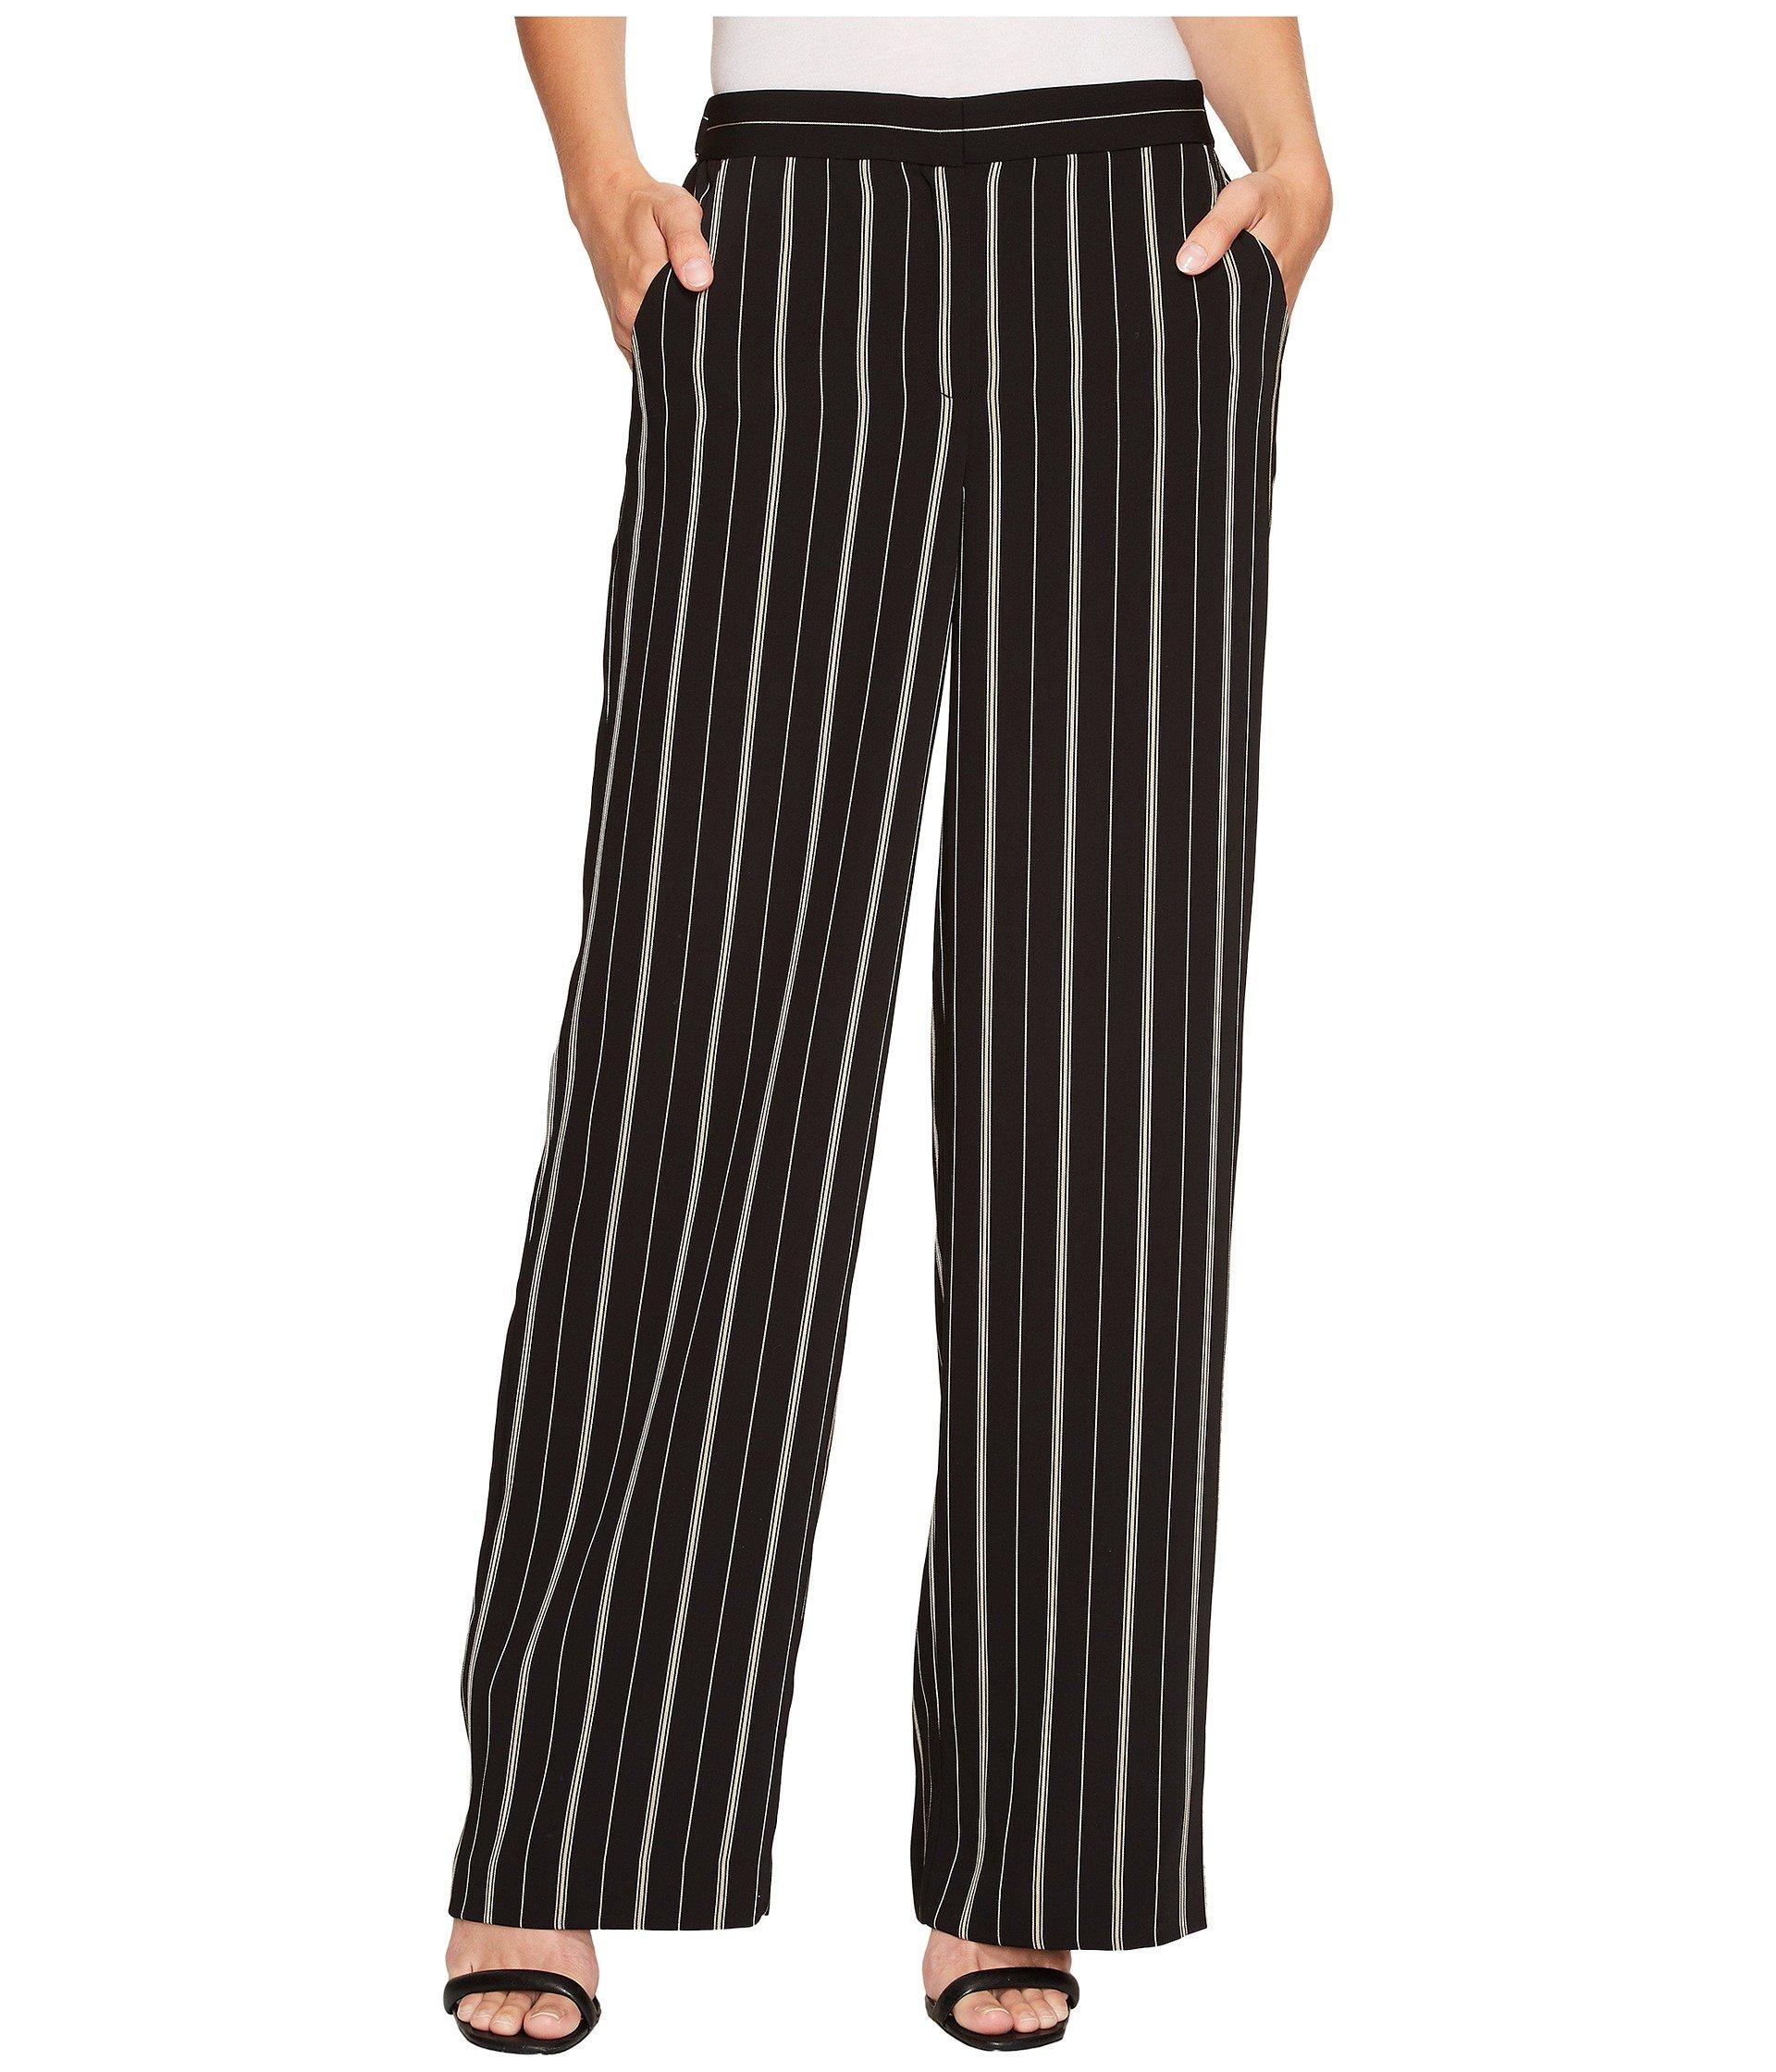 Pantalón para Mujer Vince Camuto Stripe Pull-On Pants  + Vince Camuto en VeoyCompro.net